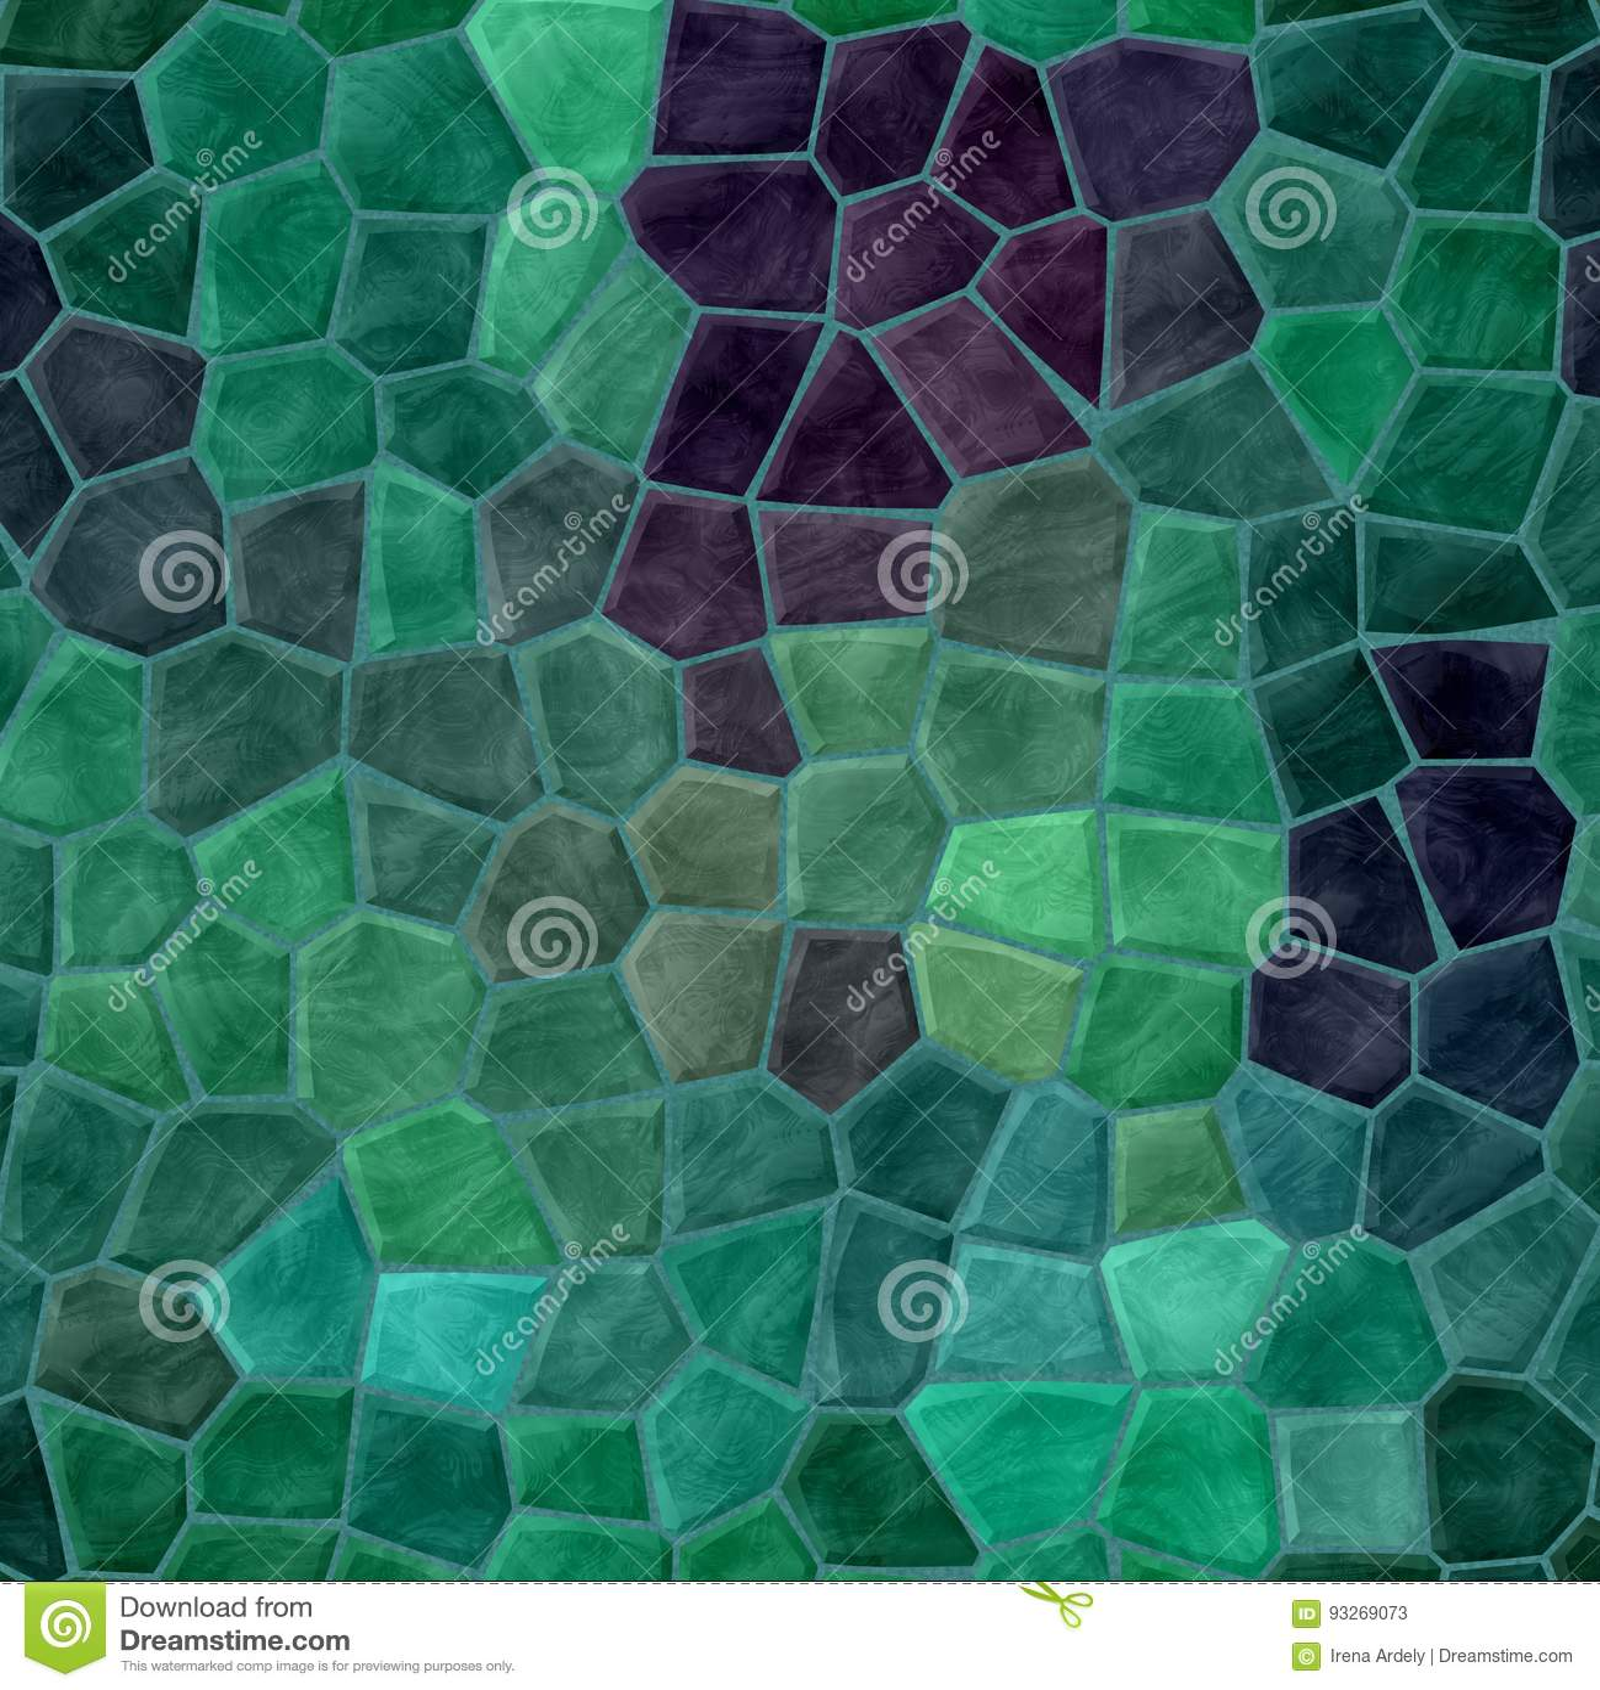 Purple Background Tiles Royalty Free Stock Image